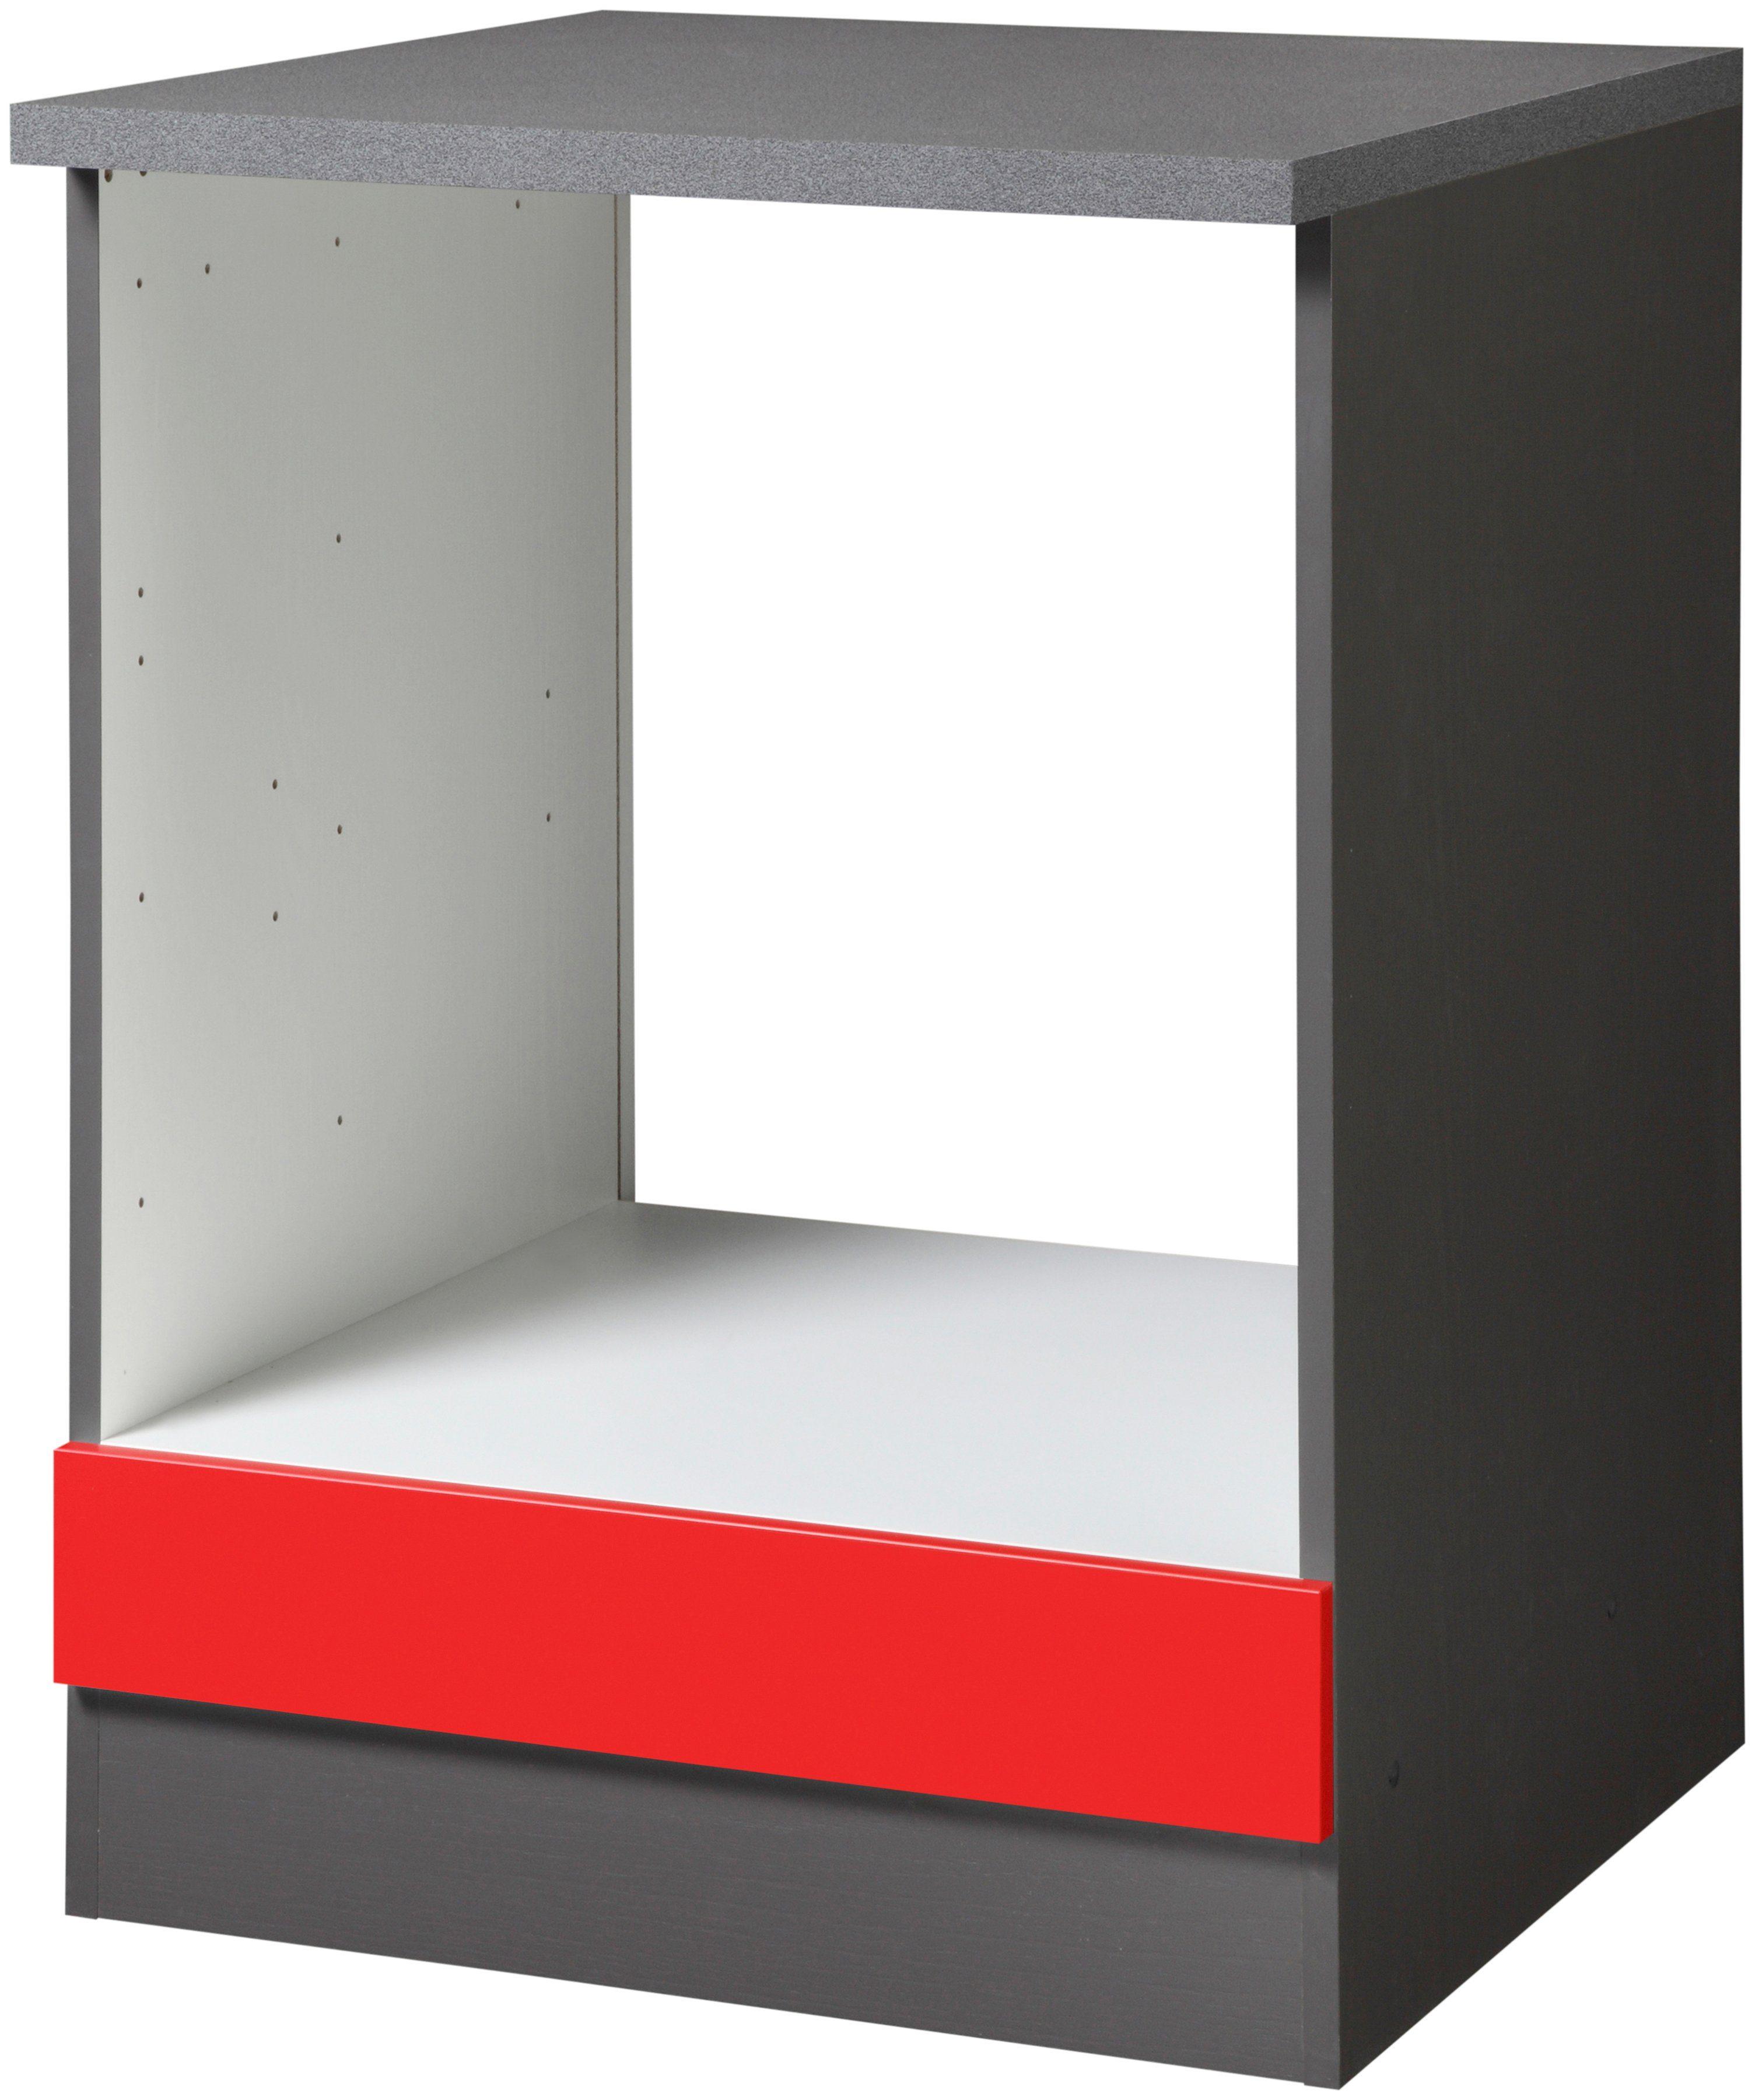 HELD MÖBEL Herdumbauschrank »Paris«, Breite 60 cm